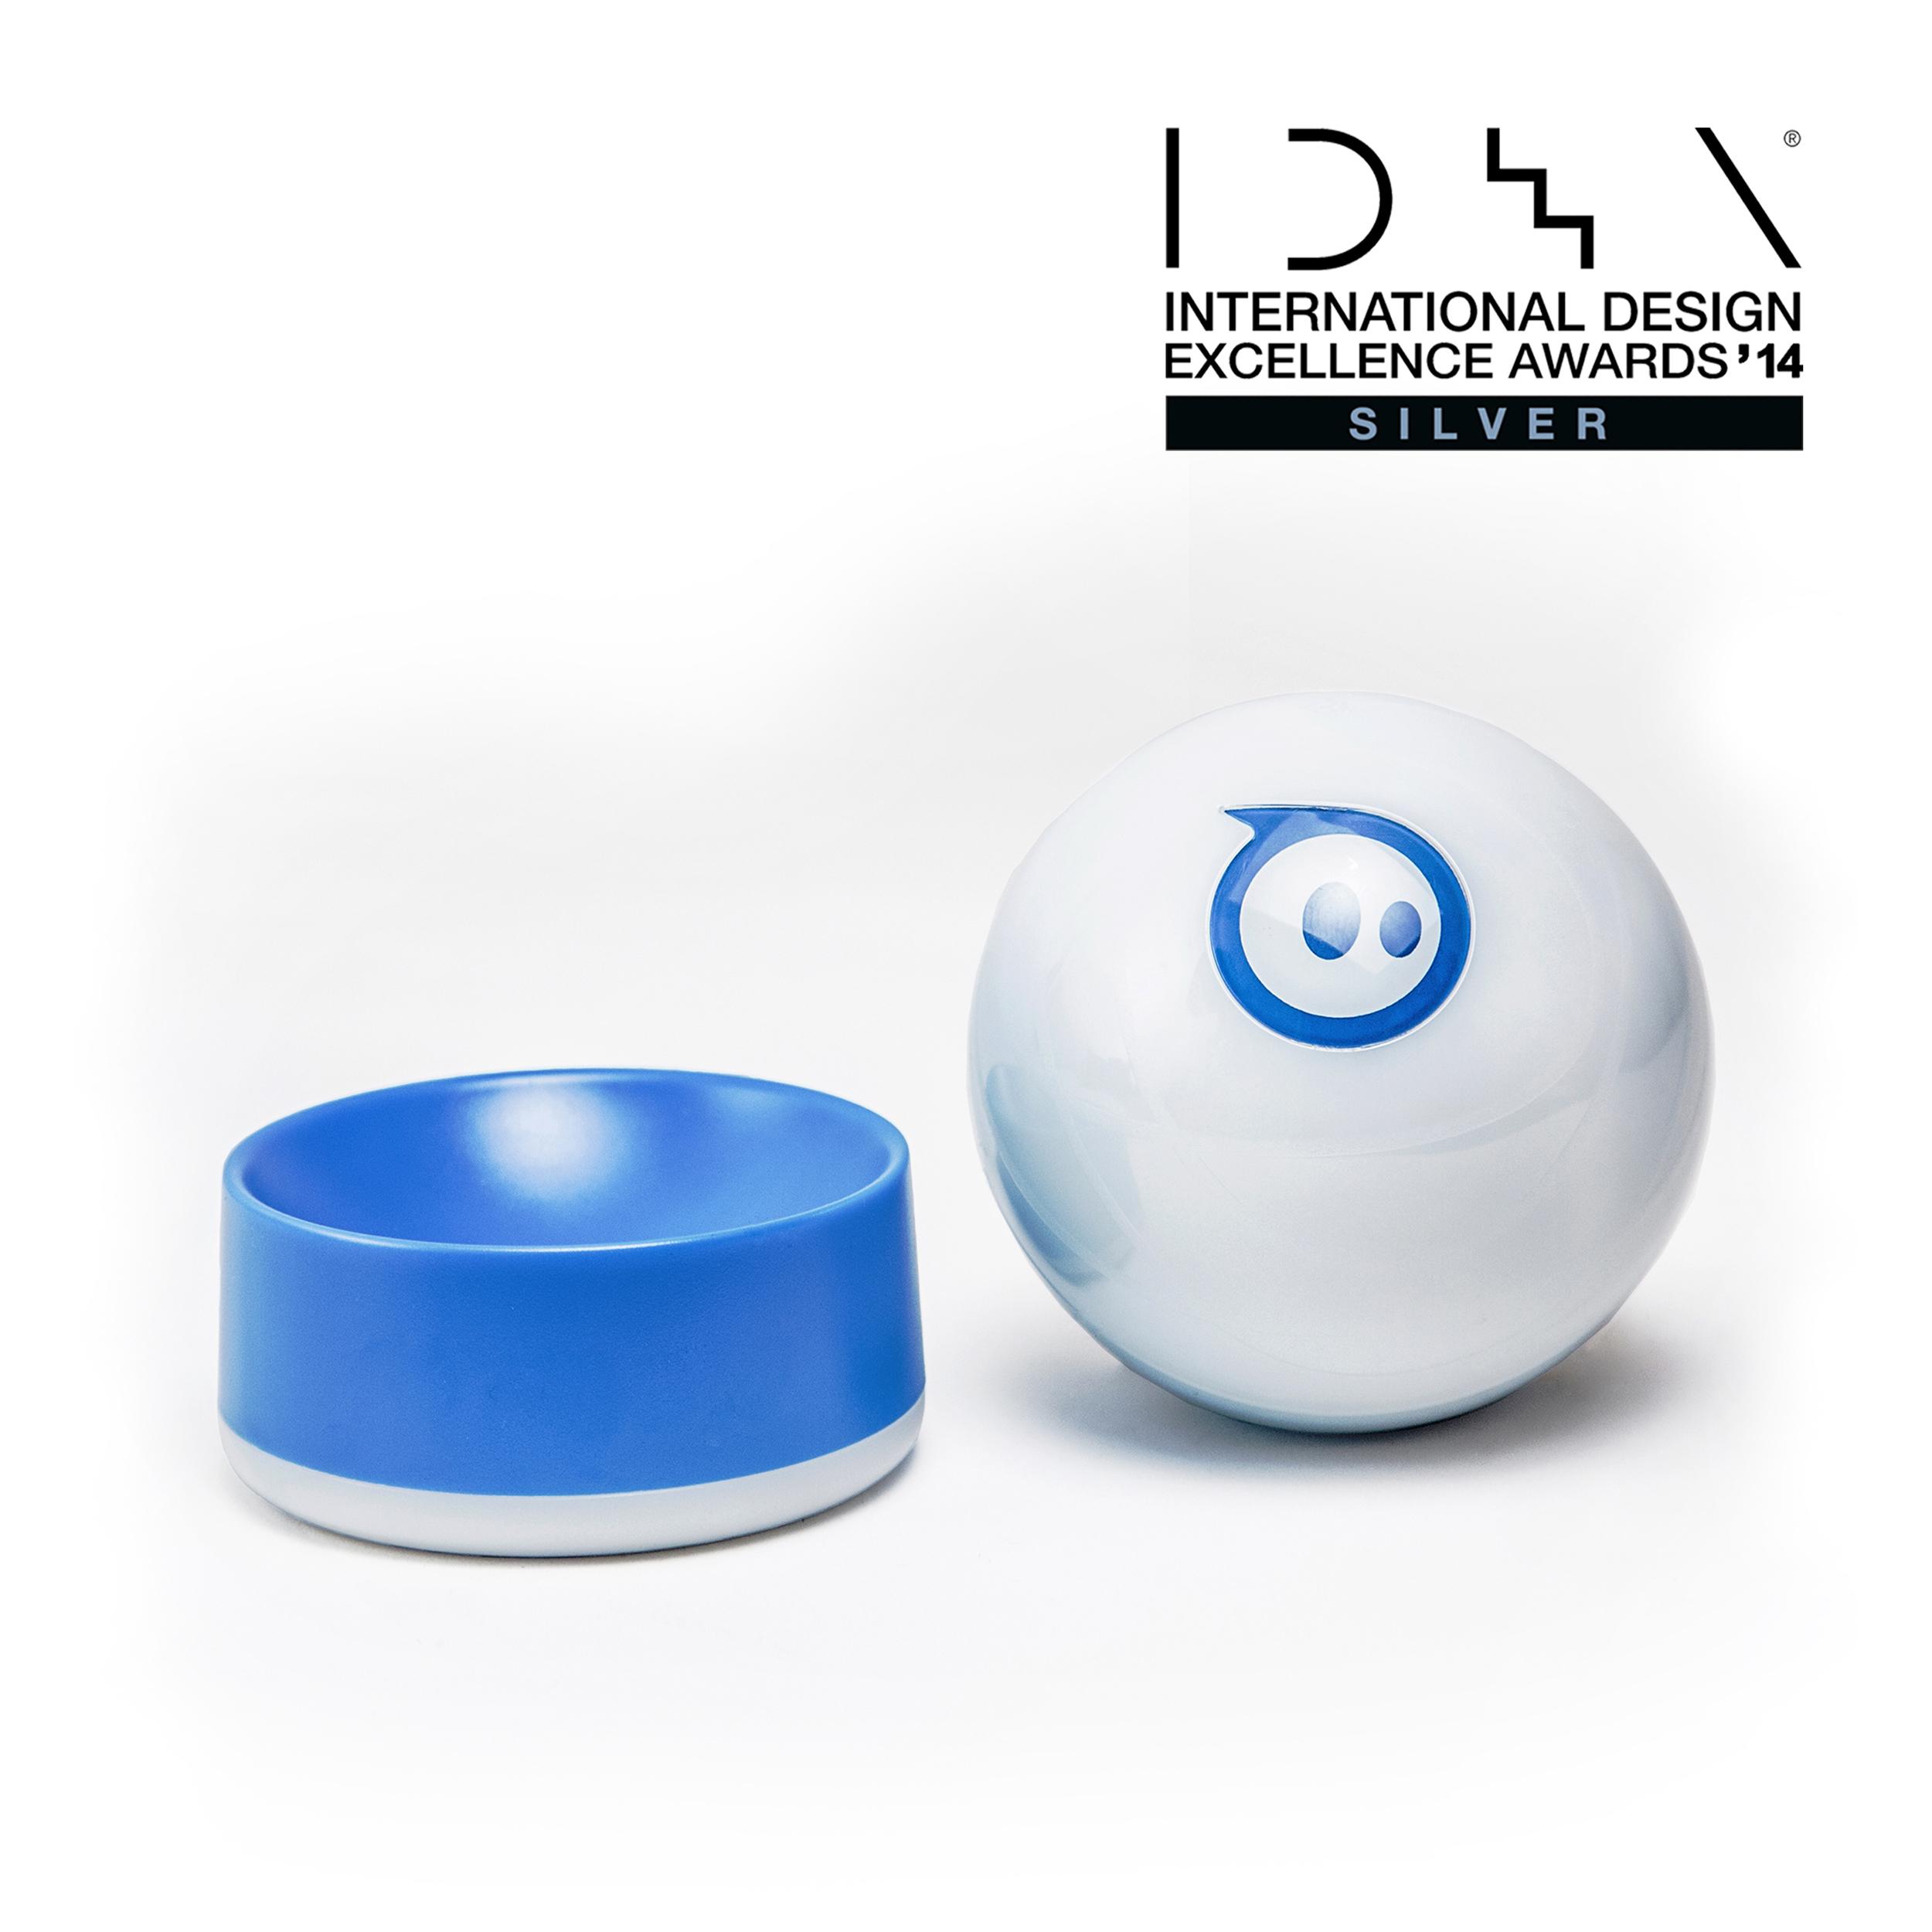 Sphero 2.0   International Design Excellence Awards (IDEA) - Silver